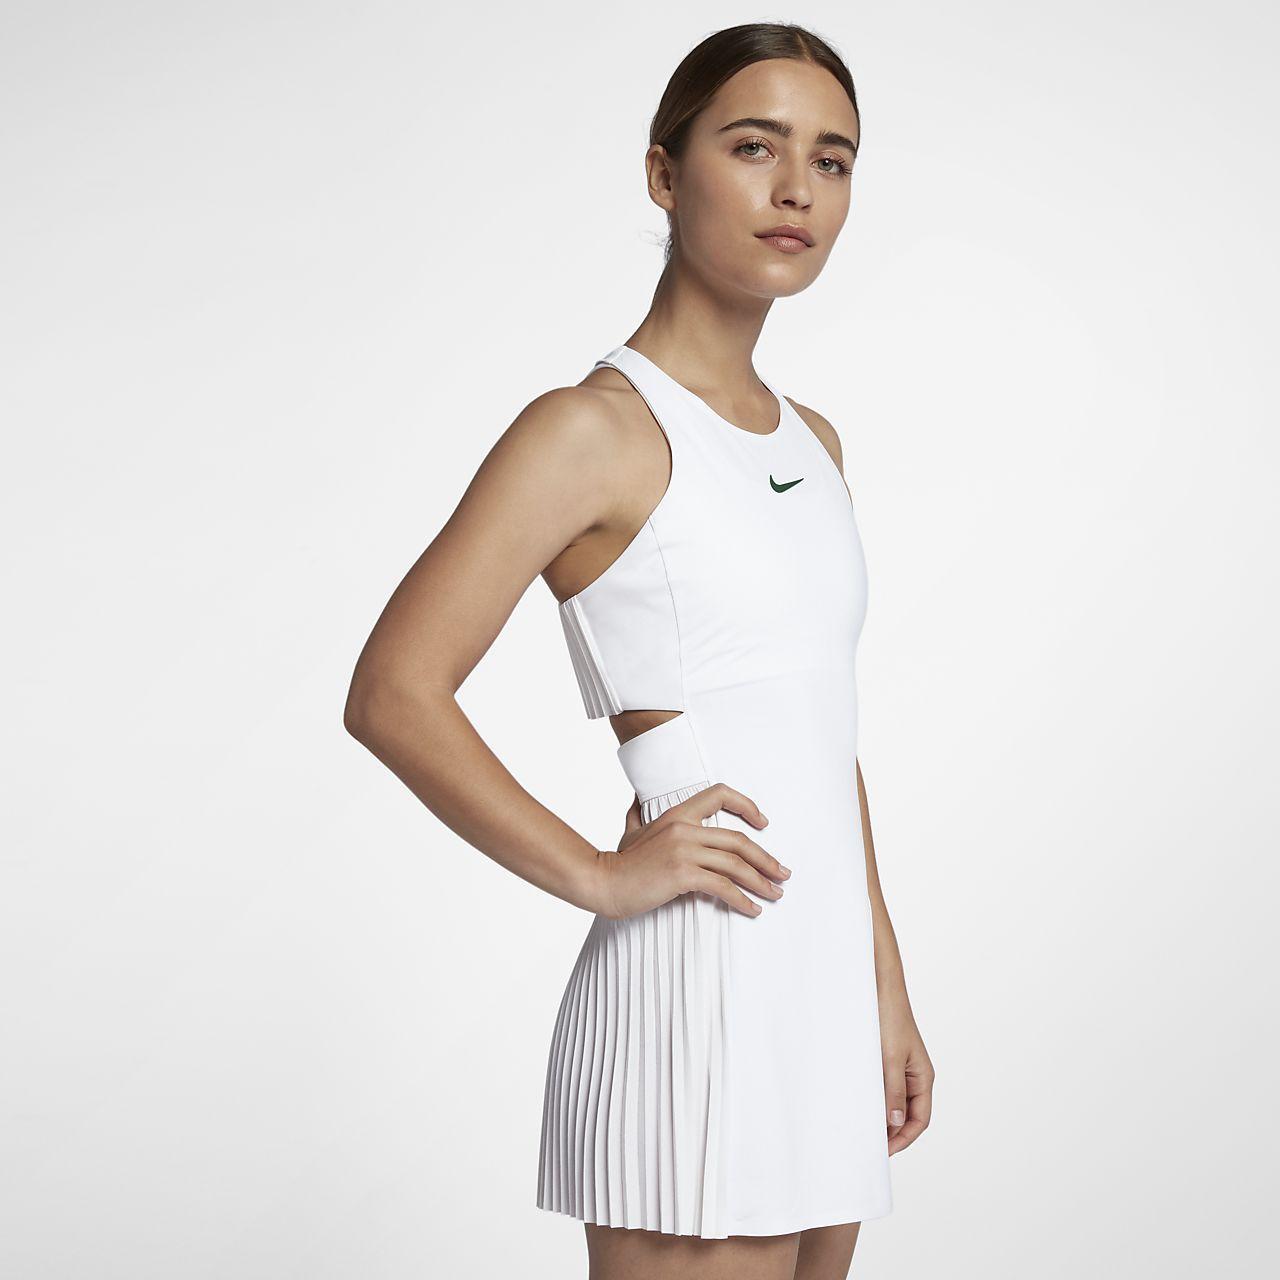 Maria Sharapova - Wimbledon Tournament 2015 - Second Round